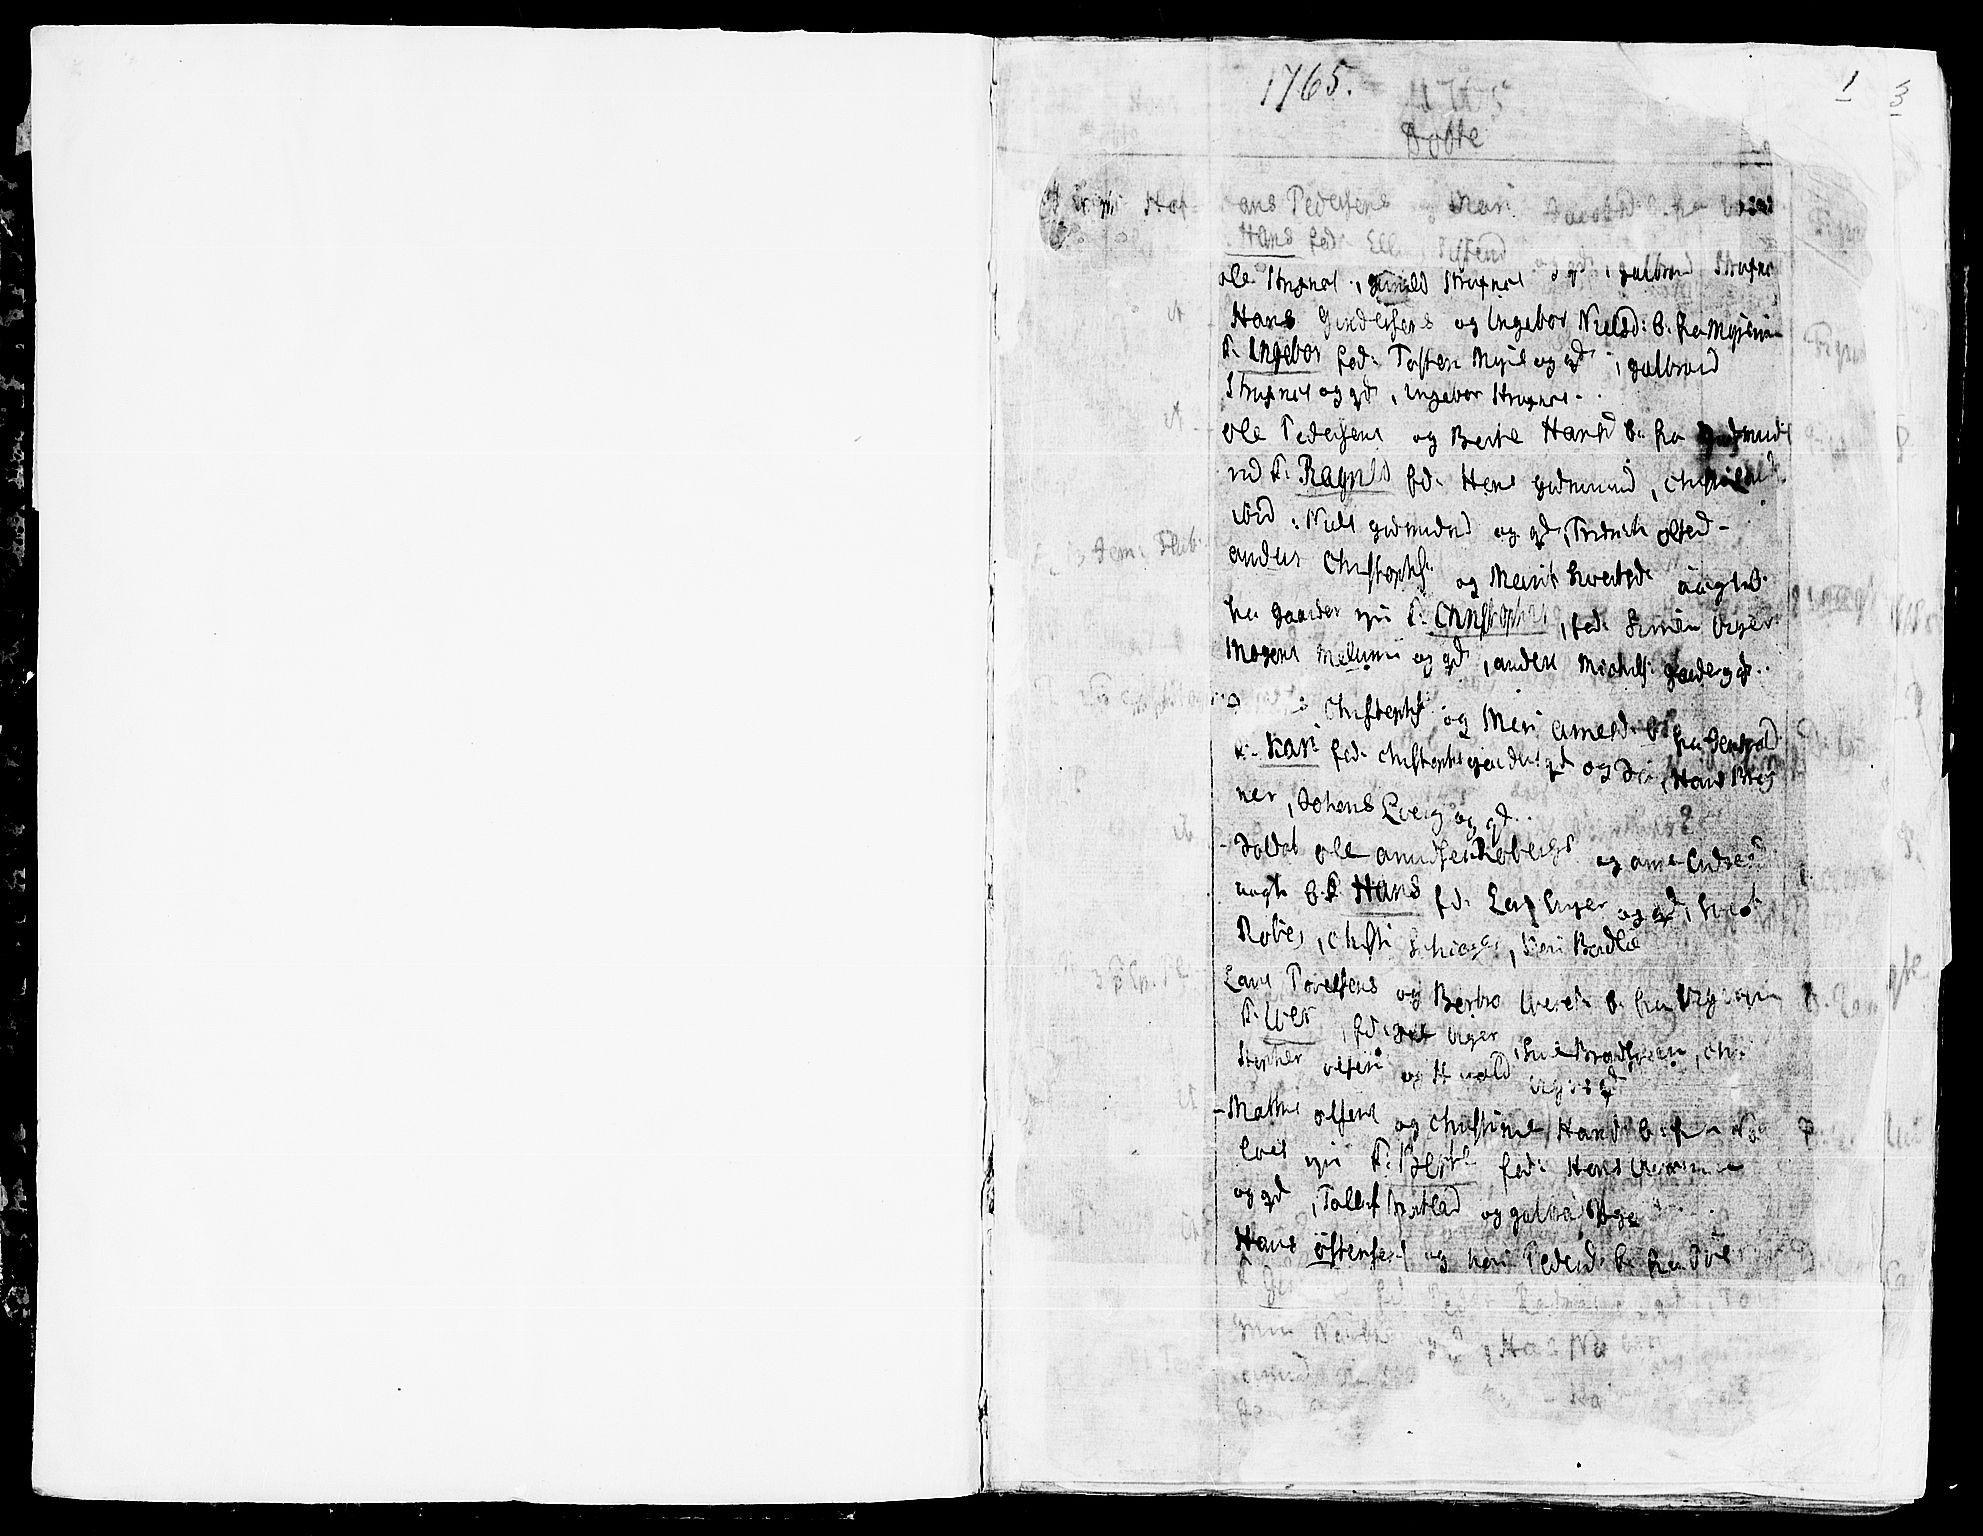 SAH, Land prestekontor, Ministerialbok nr. 5, 1765-1784, s. 0-1